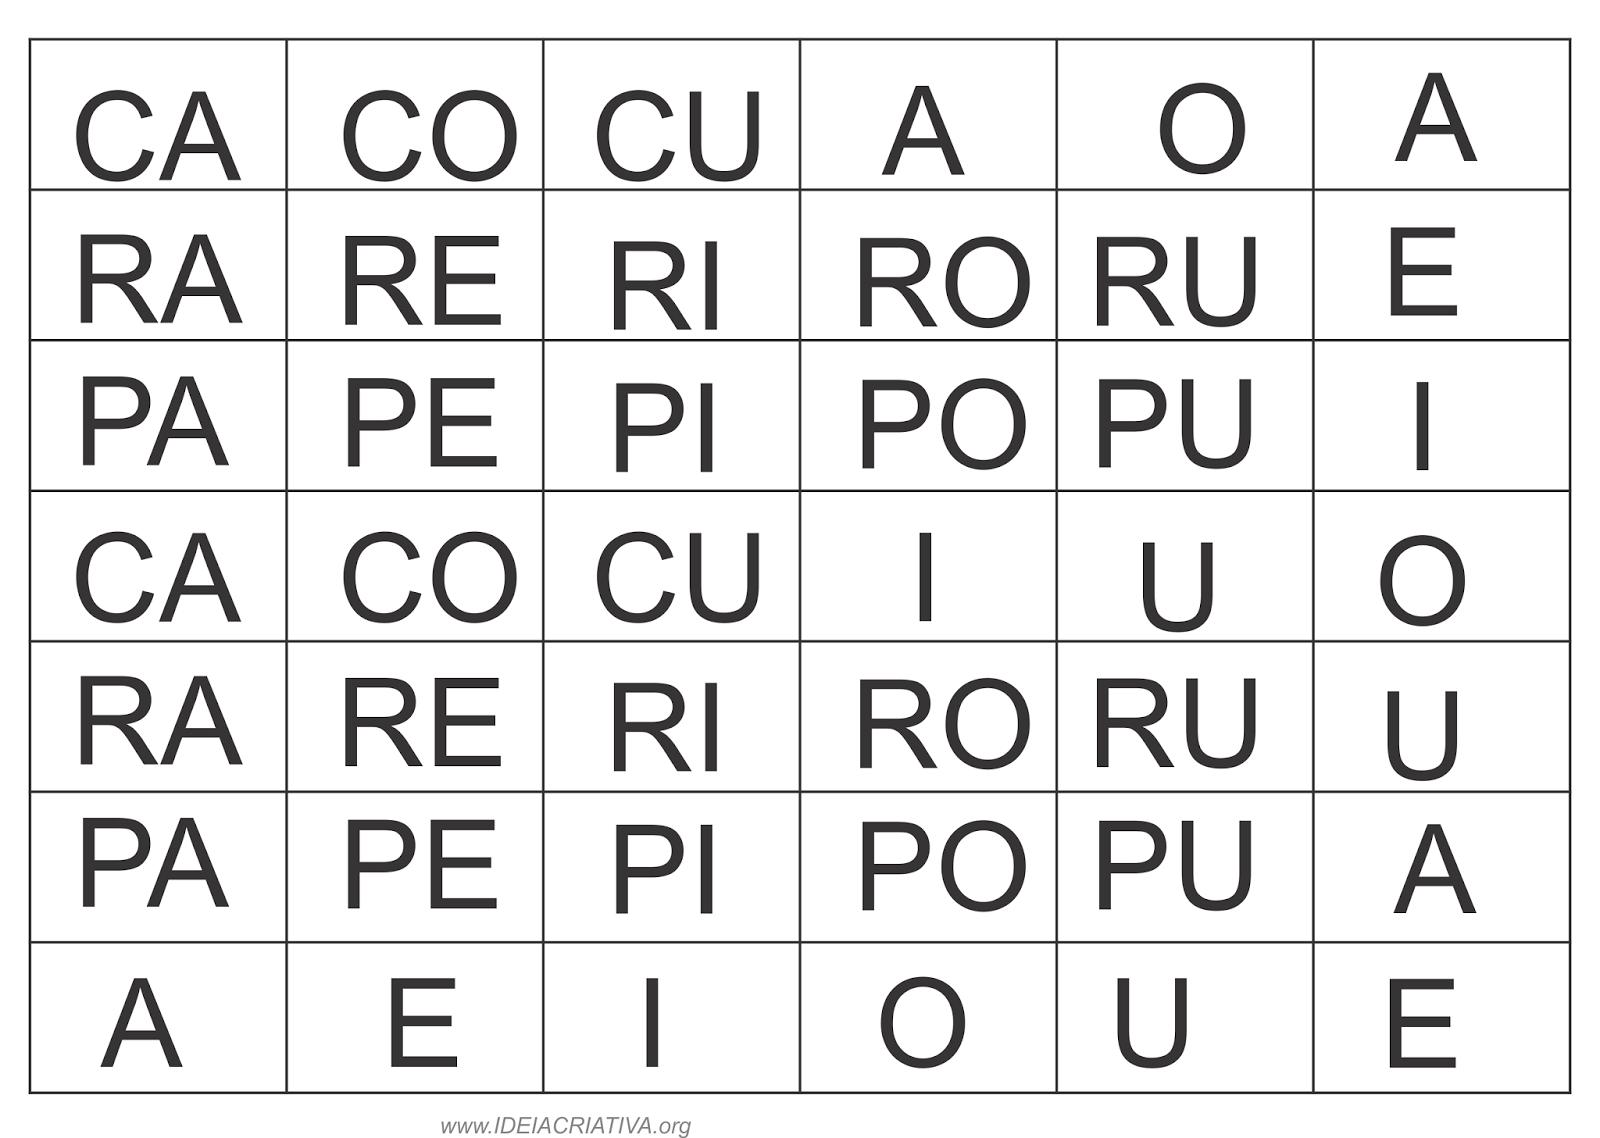 Atividade O Curupira Folclore Letra C Corte e Recorte